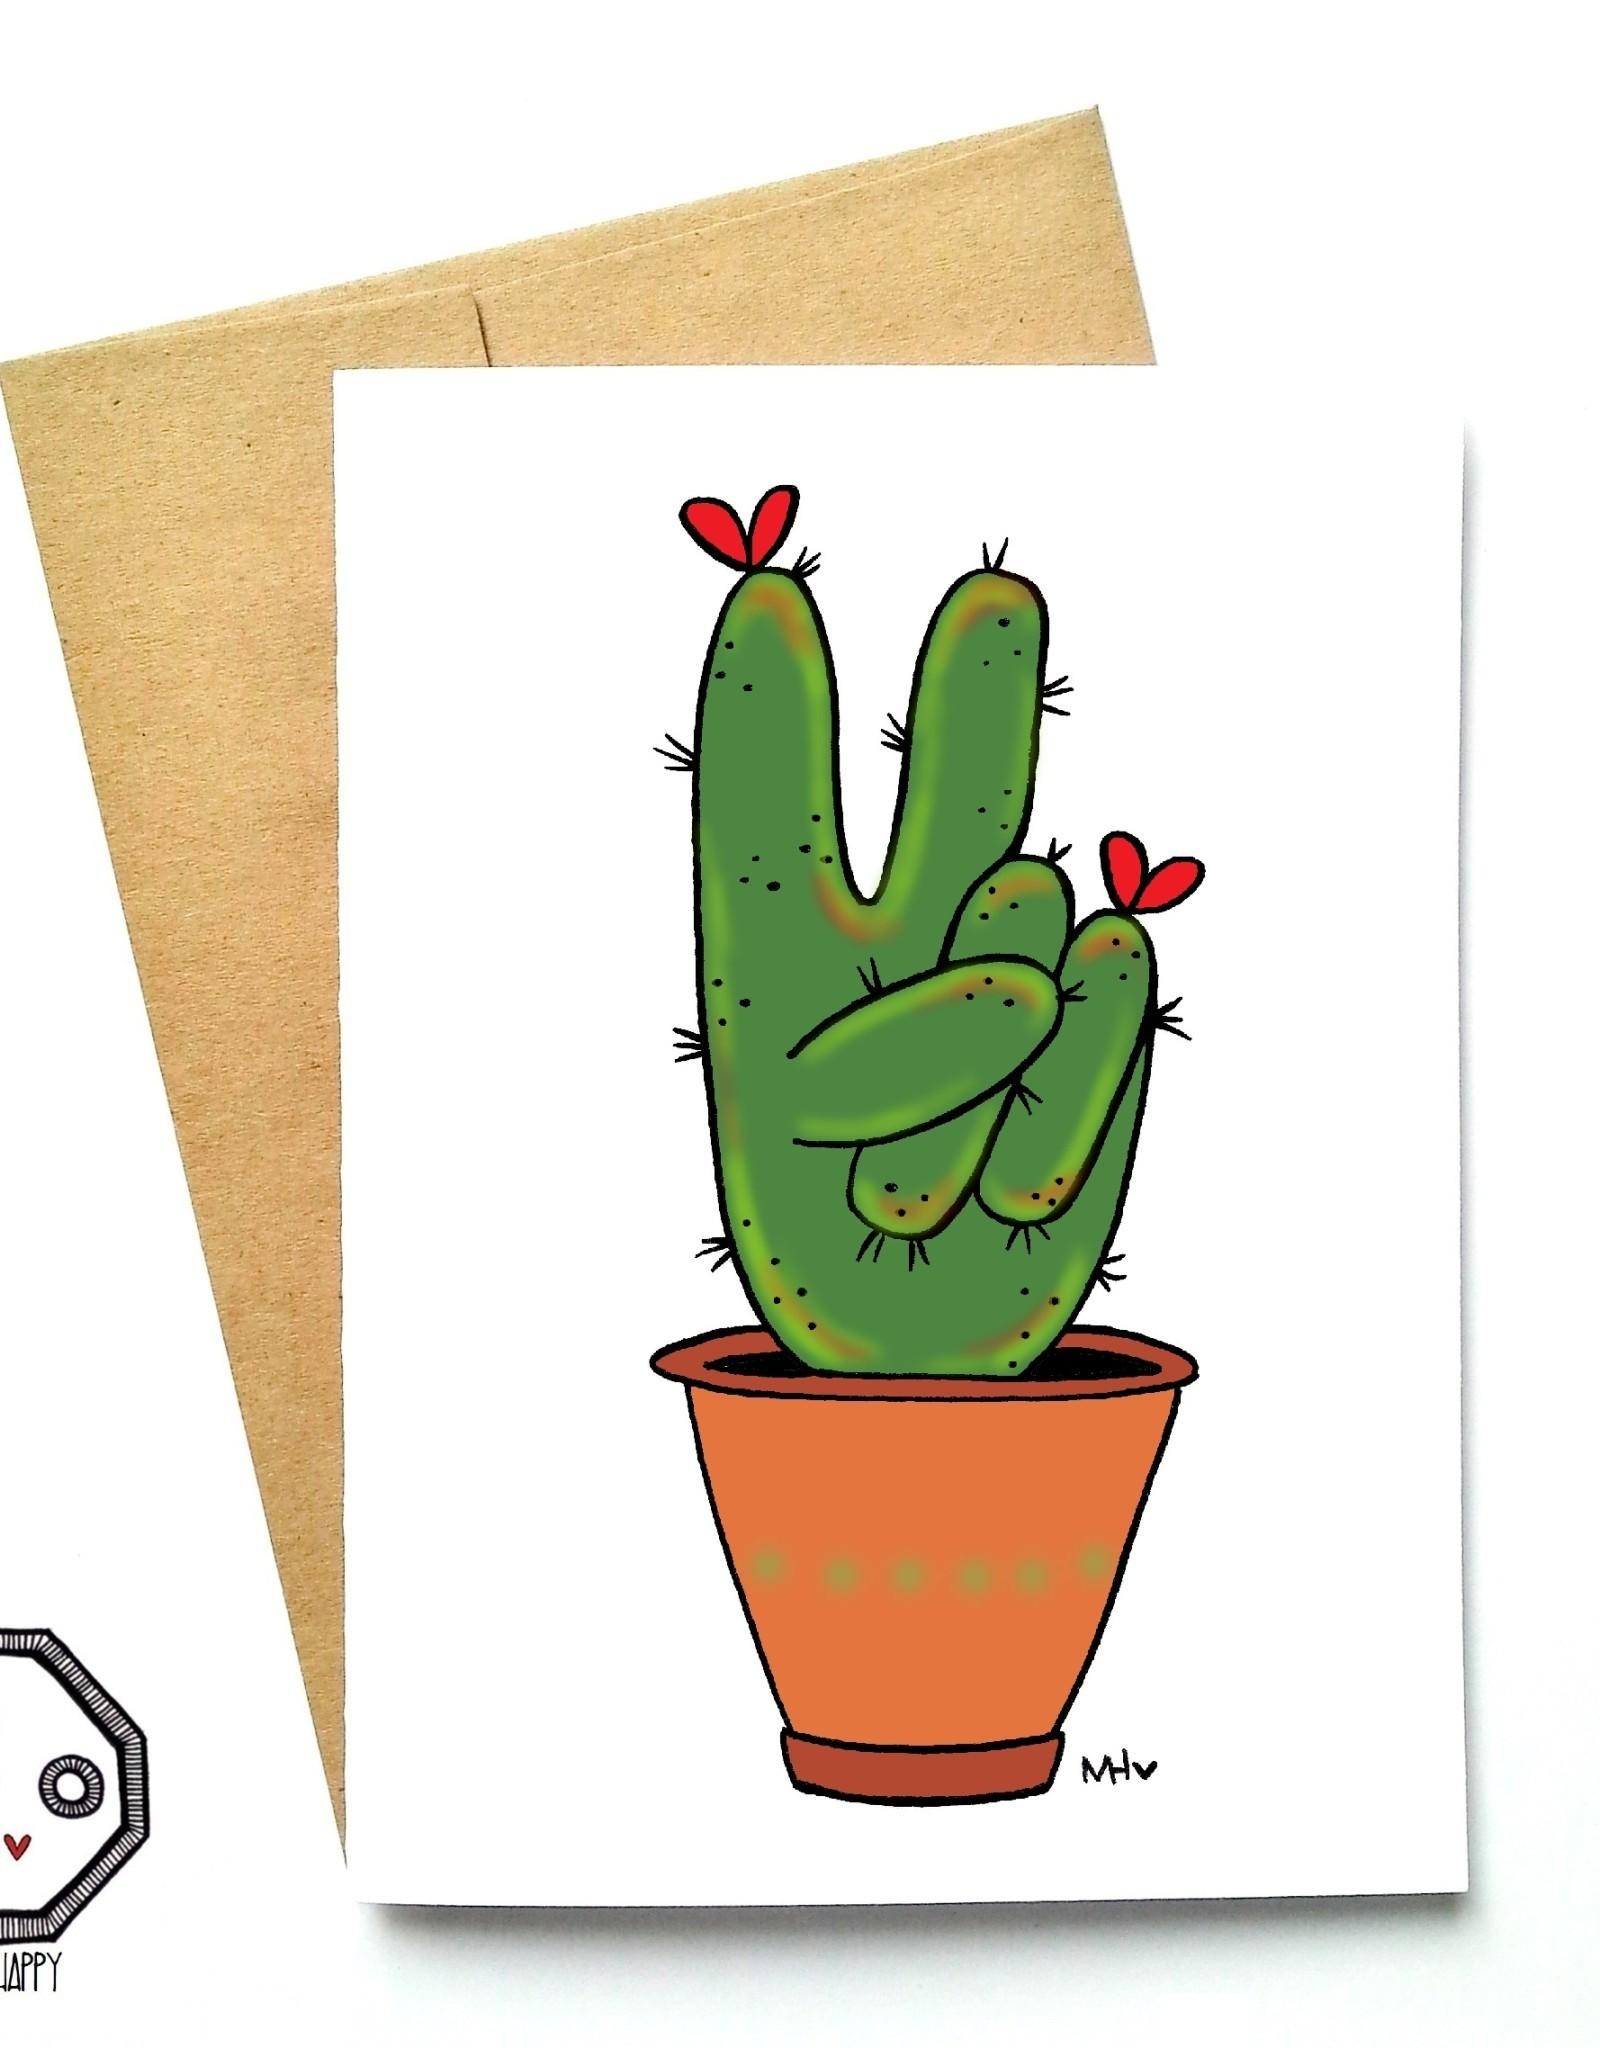 Made in Happy Carte de souhait - Cactus